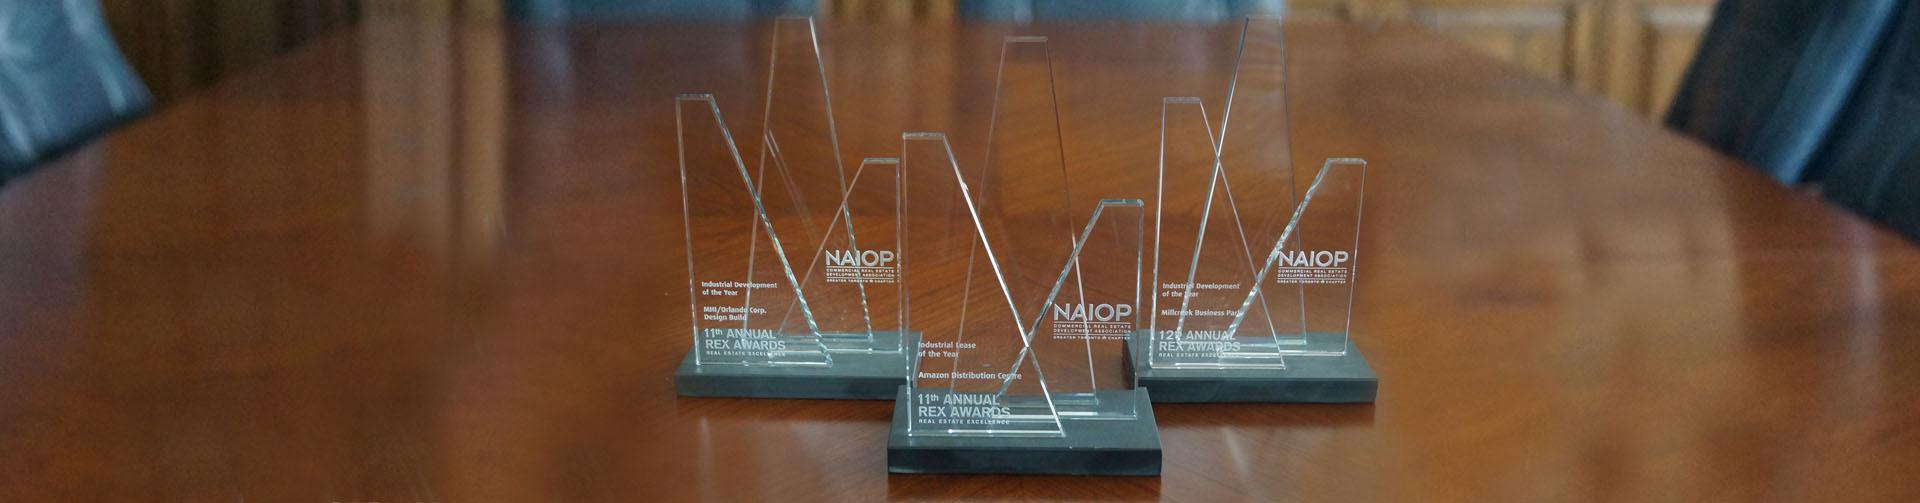 Terrific Orlando Corporation Awards Download Free Architecture Designs Pushbritishbridgeorg